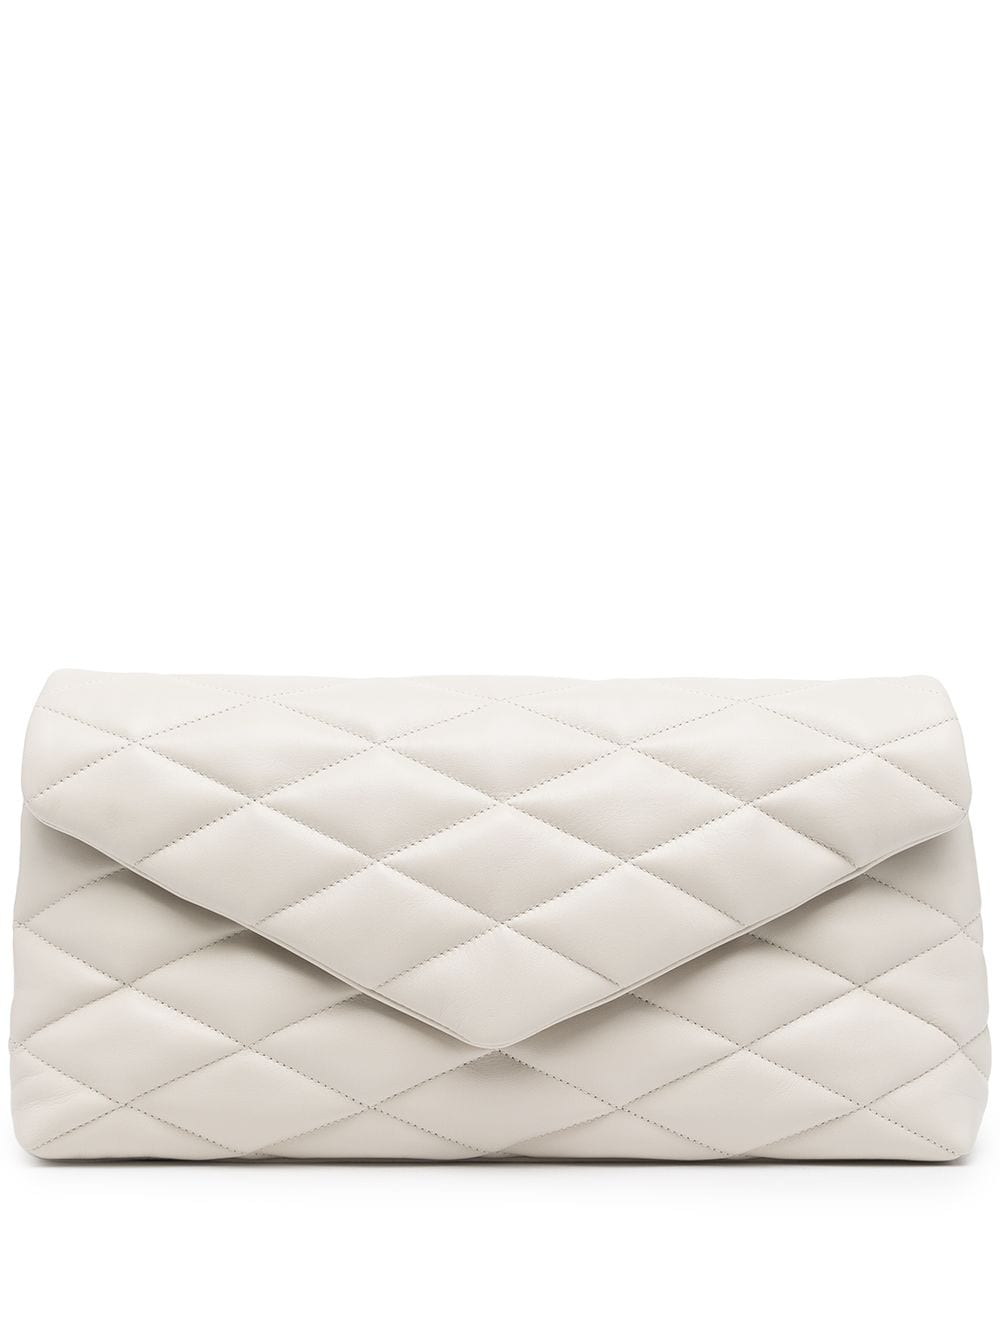 Picture of Saint Laurent | Sade Puffer Envelope Clutch Bag